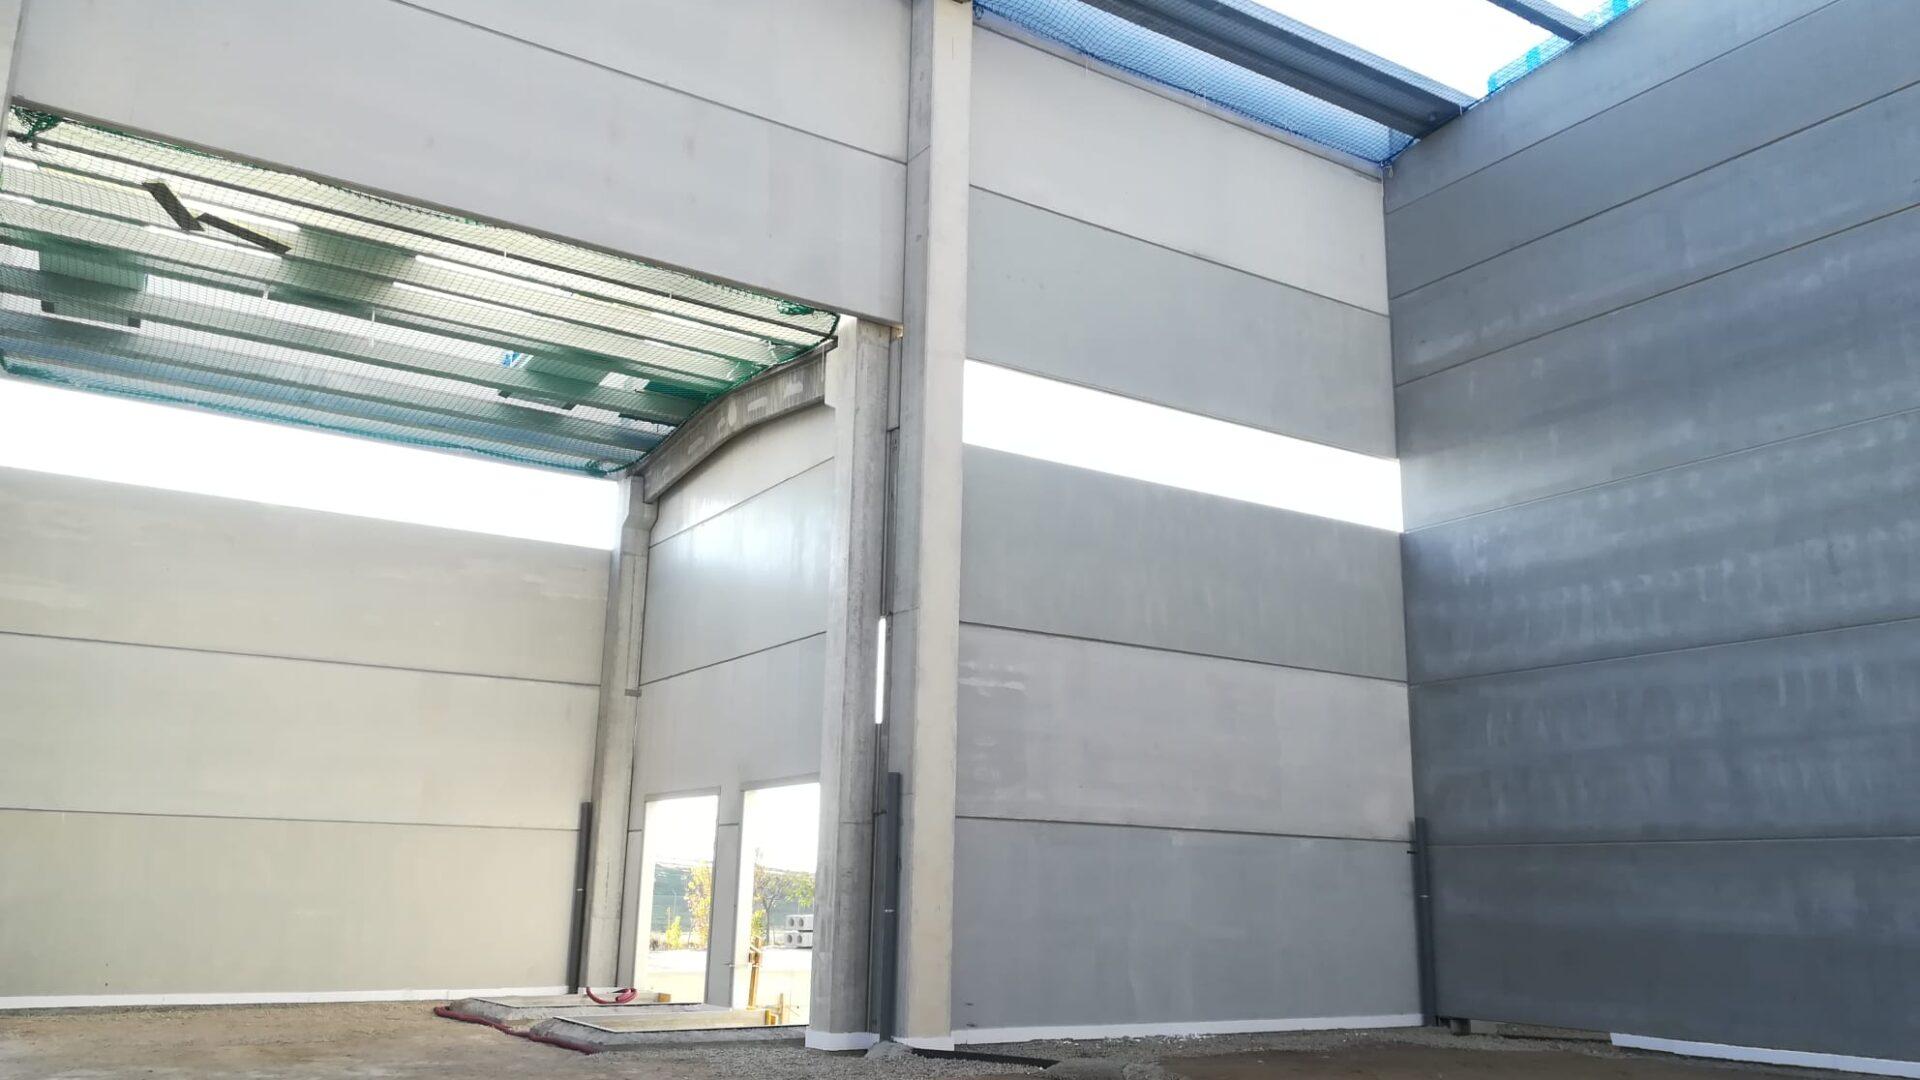 Transambiental - Under construction, internal view